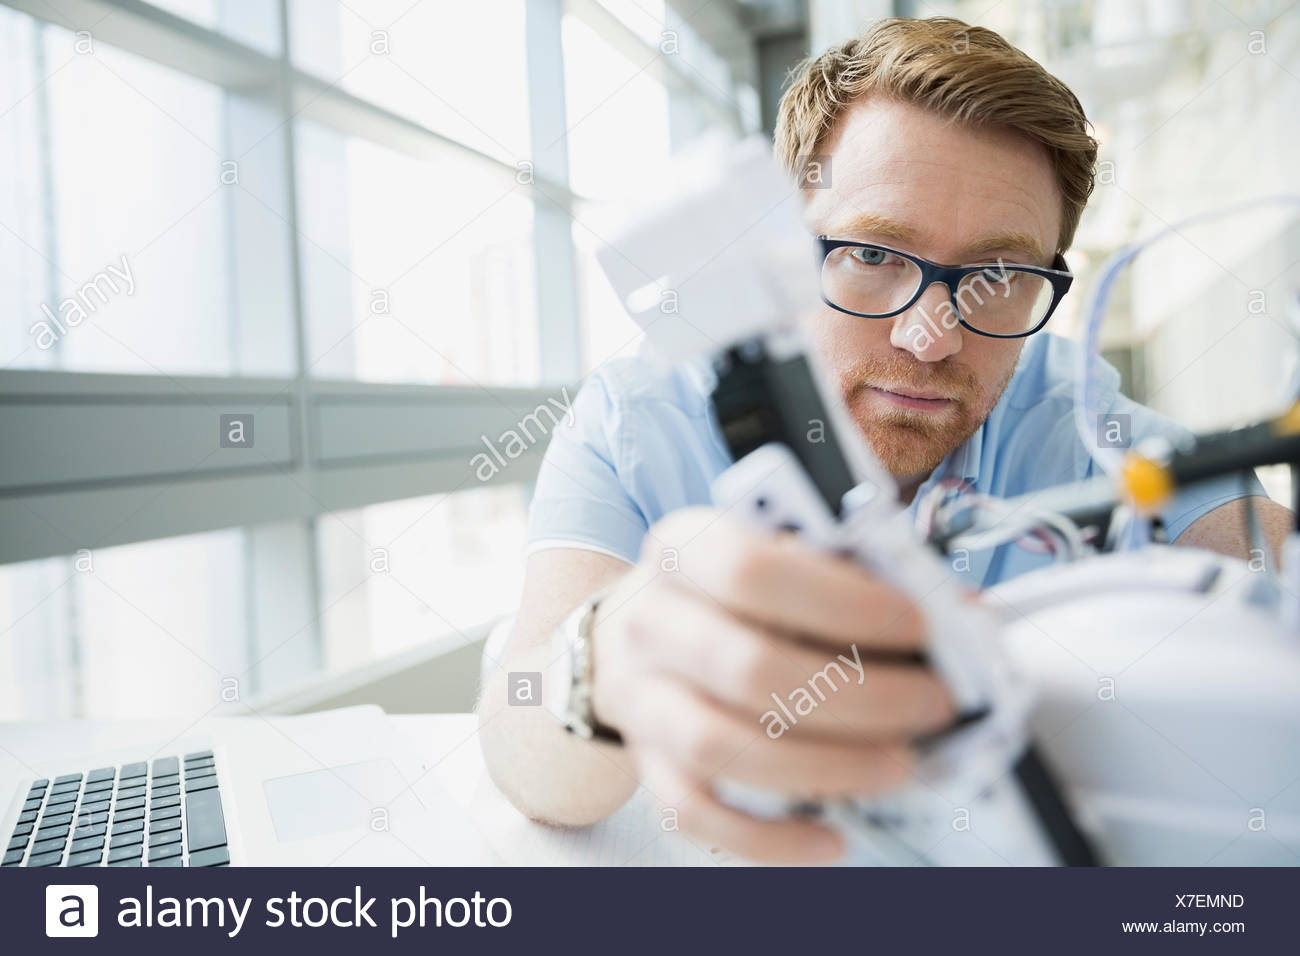 Ingegnere focalizzato esaminando robot Immagini Stock